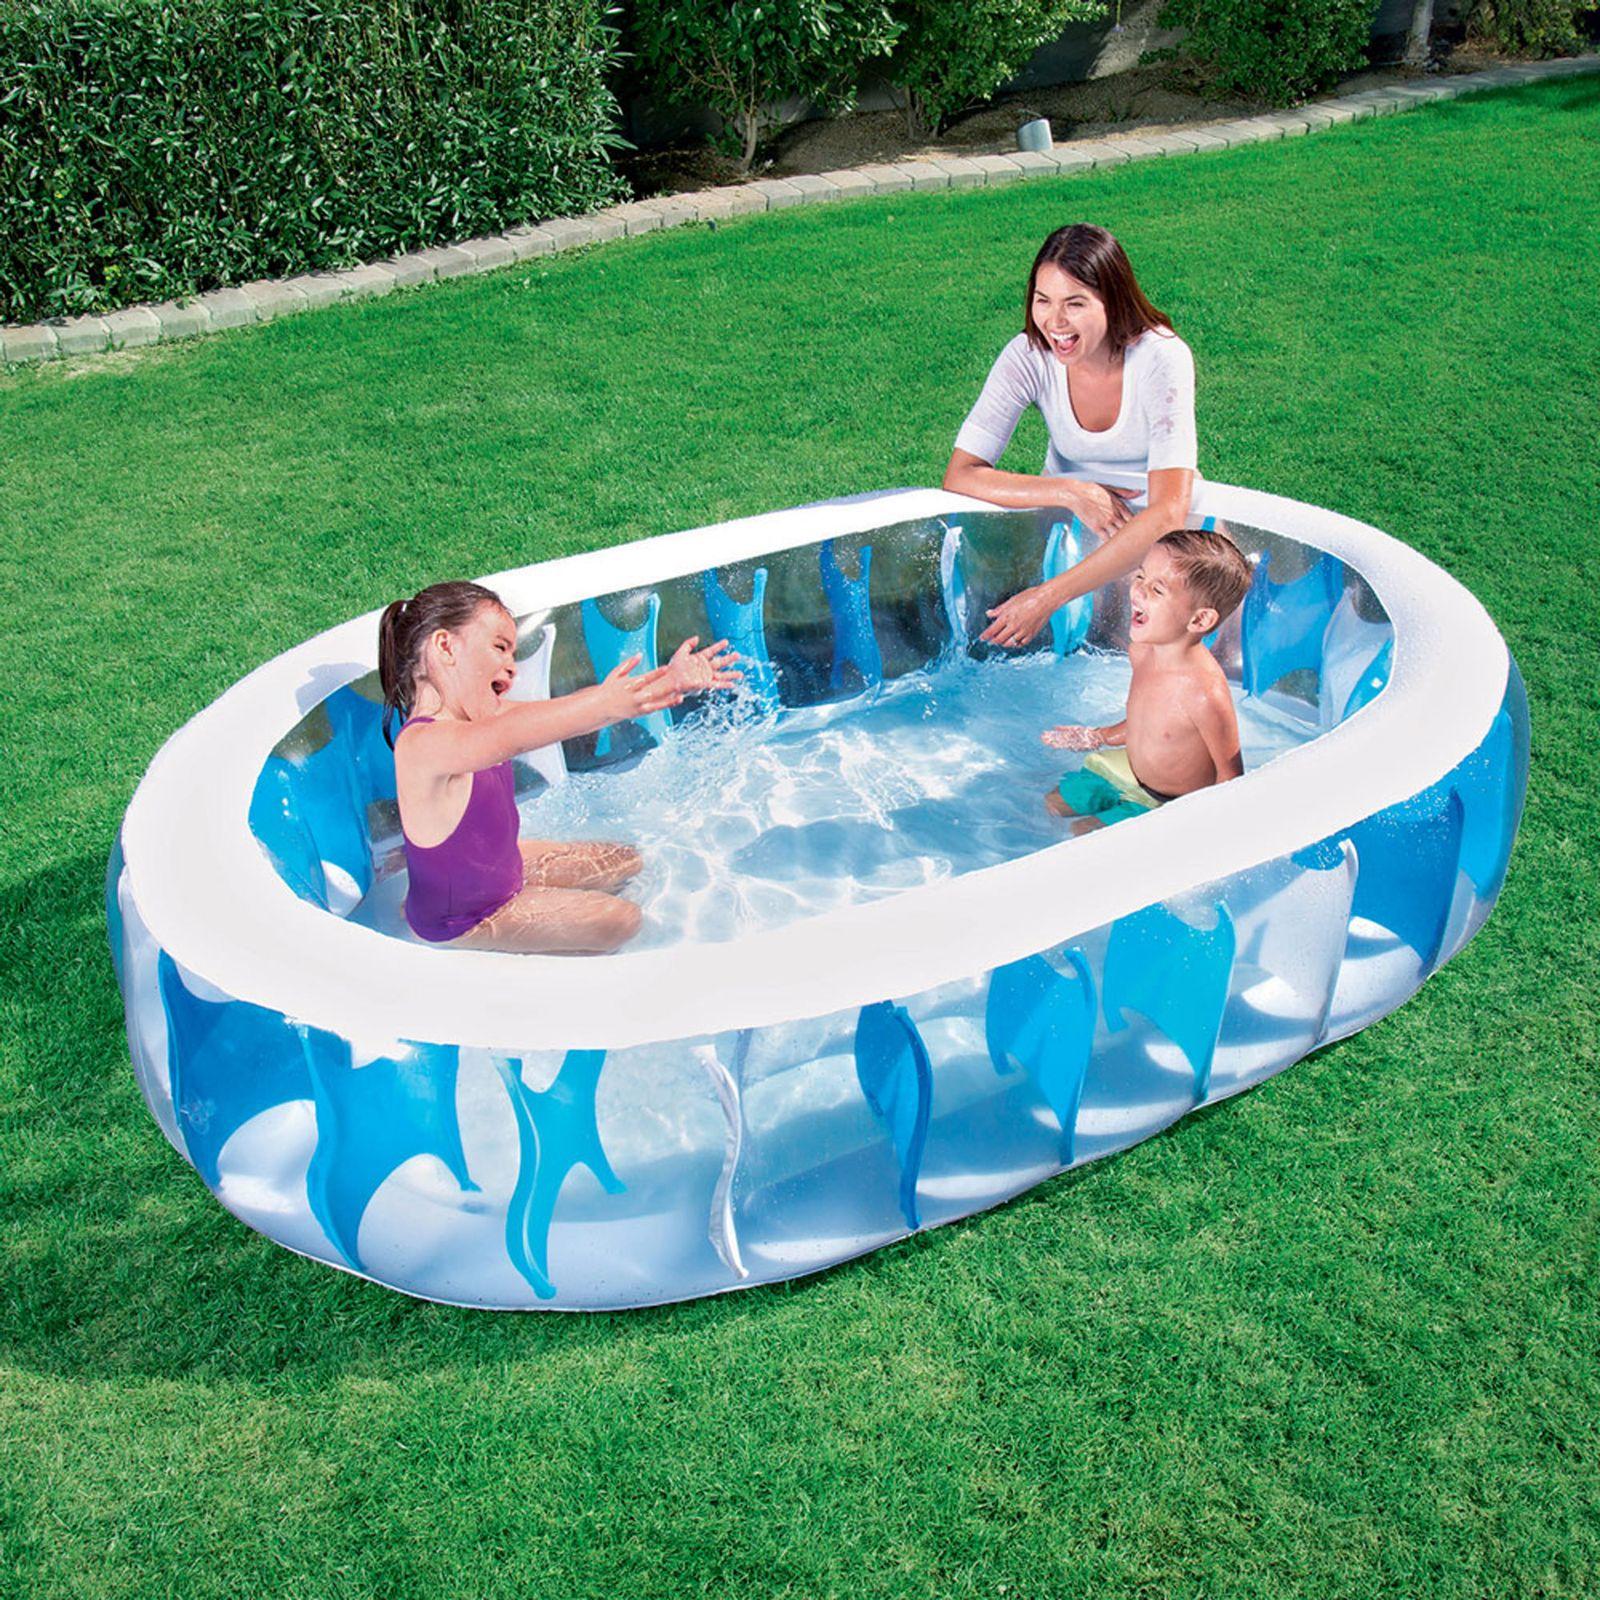 Piscina gonfiabile Eliptic Pool 229 x 152 x 51 cm BESTWAY VARI COLORI A CASO